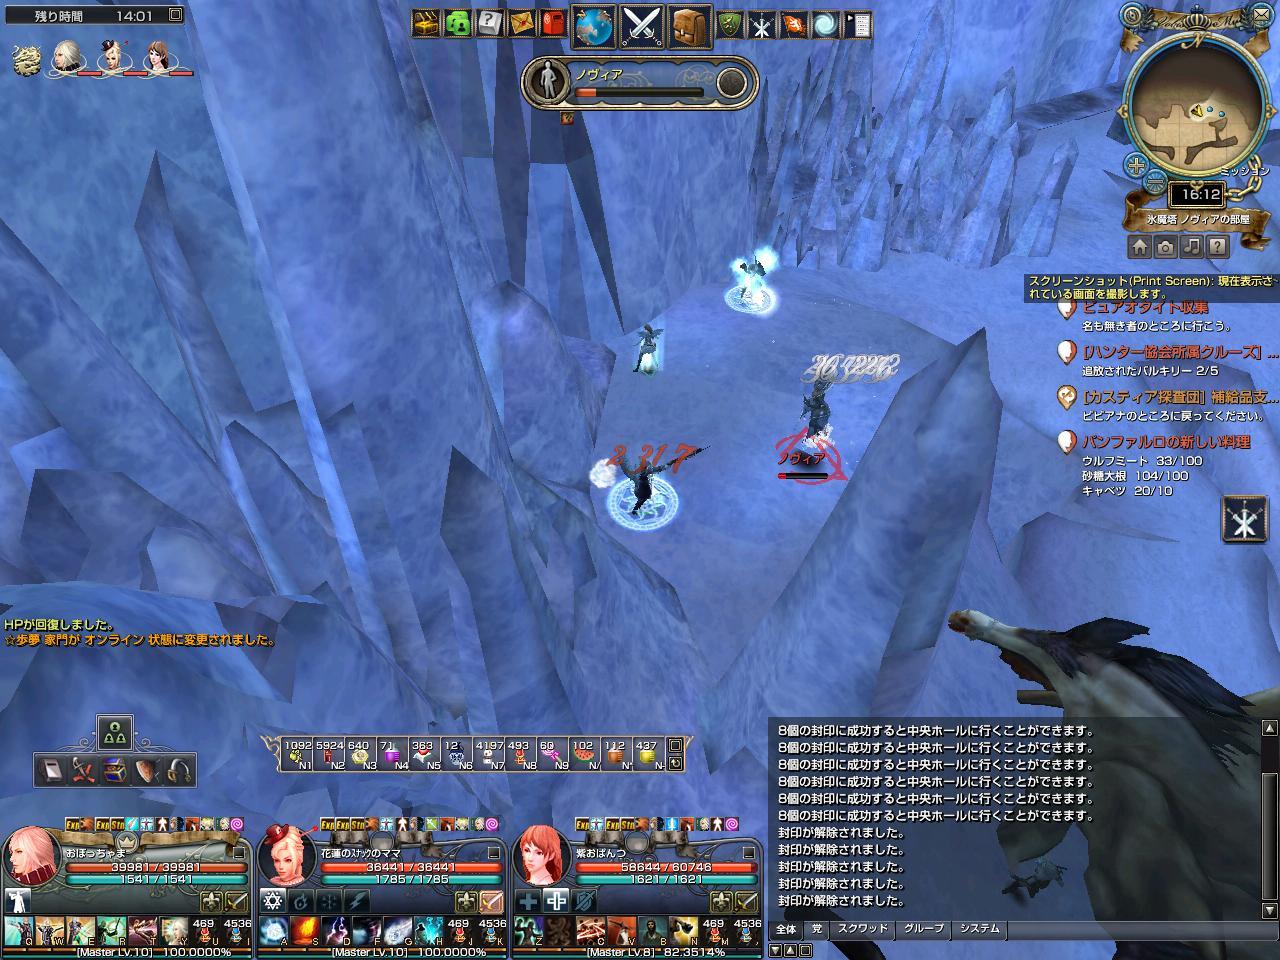 capture_00298_20120204145049.jpg